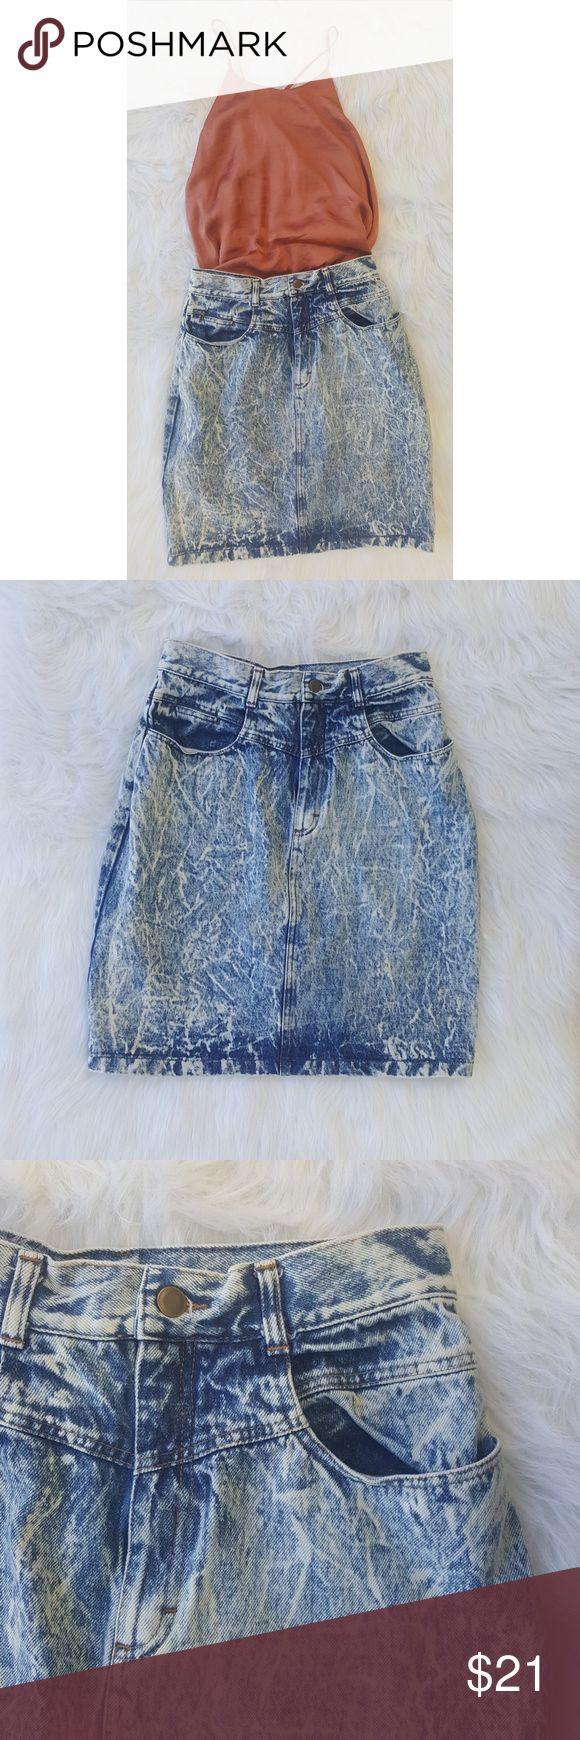 Selling this Vintage Acid Washed High Waisted Jean Skirt on Poshmark! My username is: alixclausen. #shopmycloset #poshmark #fashion #shopping #style #forsale #Dresses & Skirts